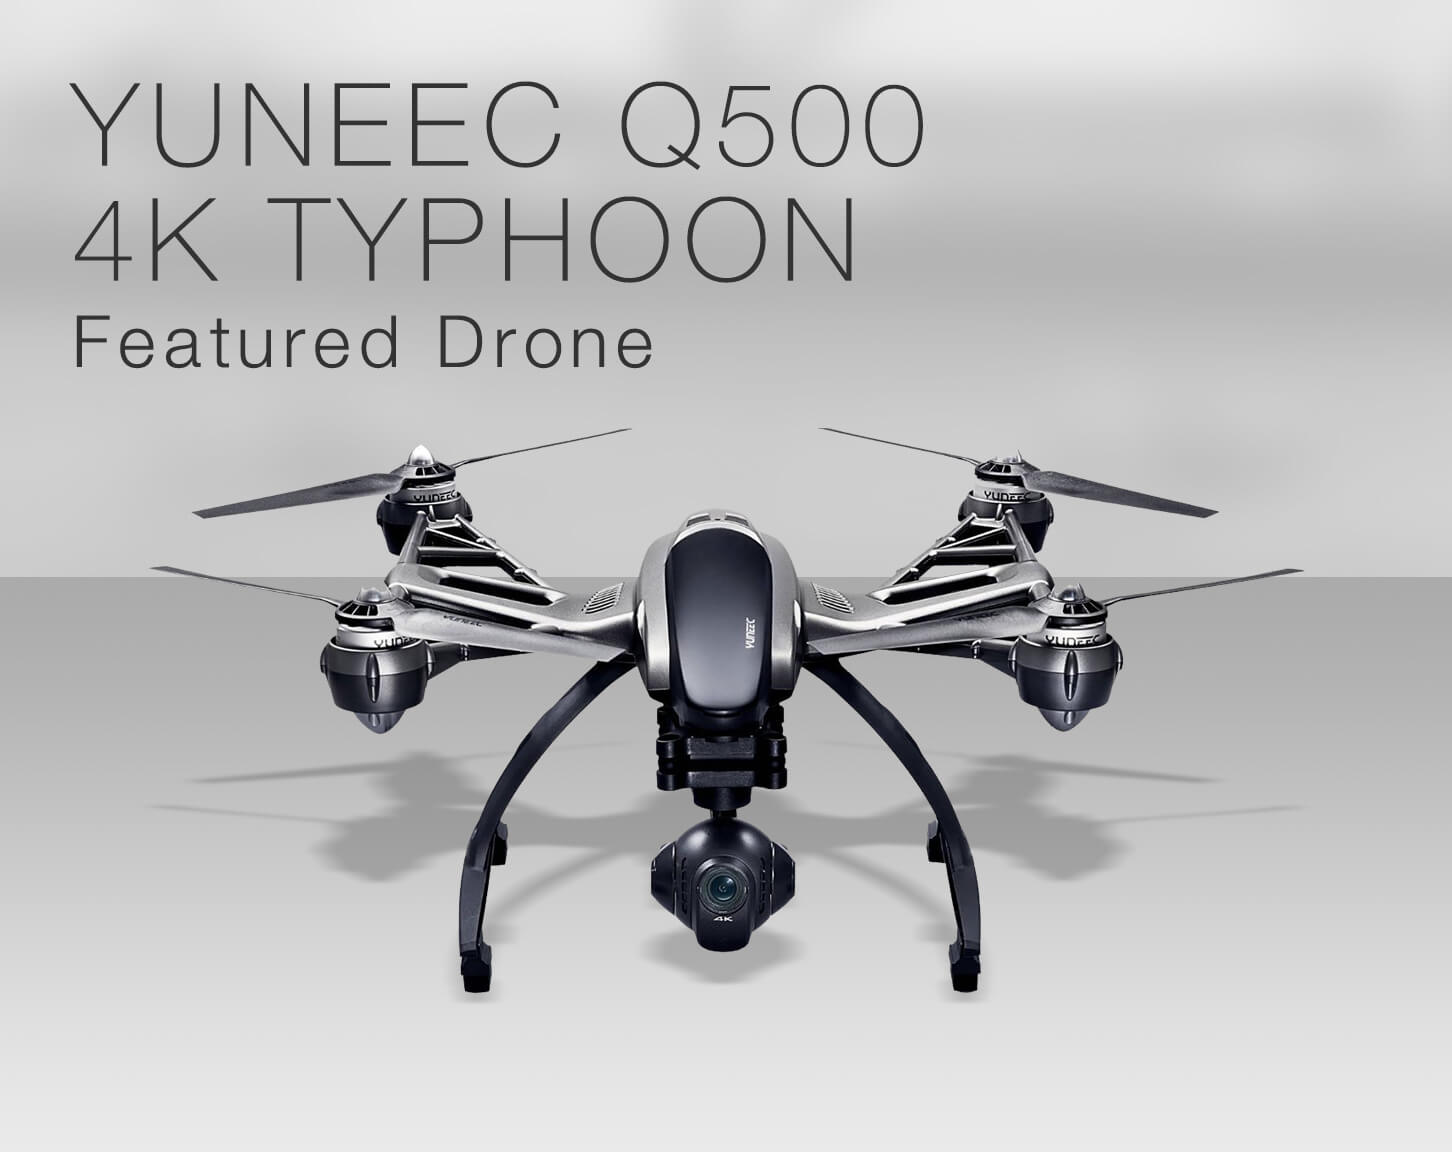 Yuneec Q500 4K Typhoon